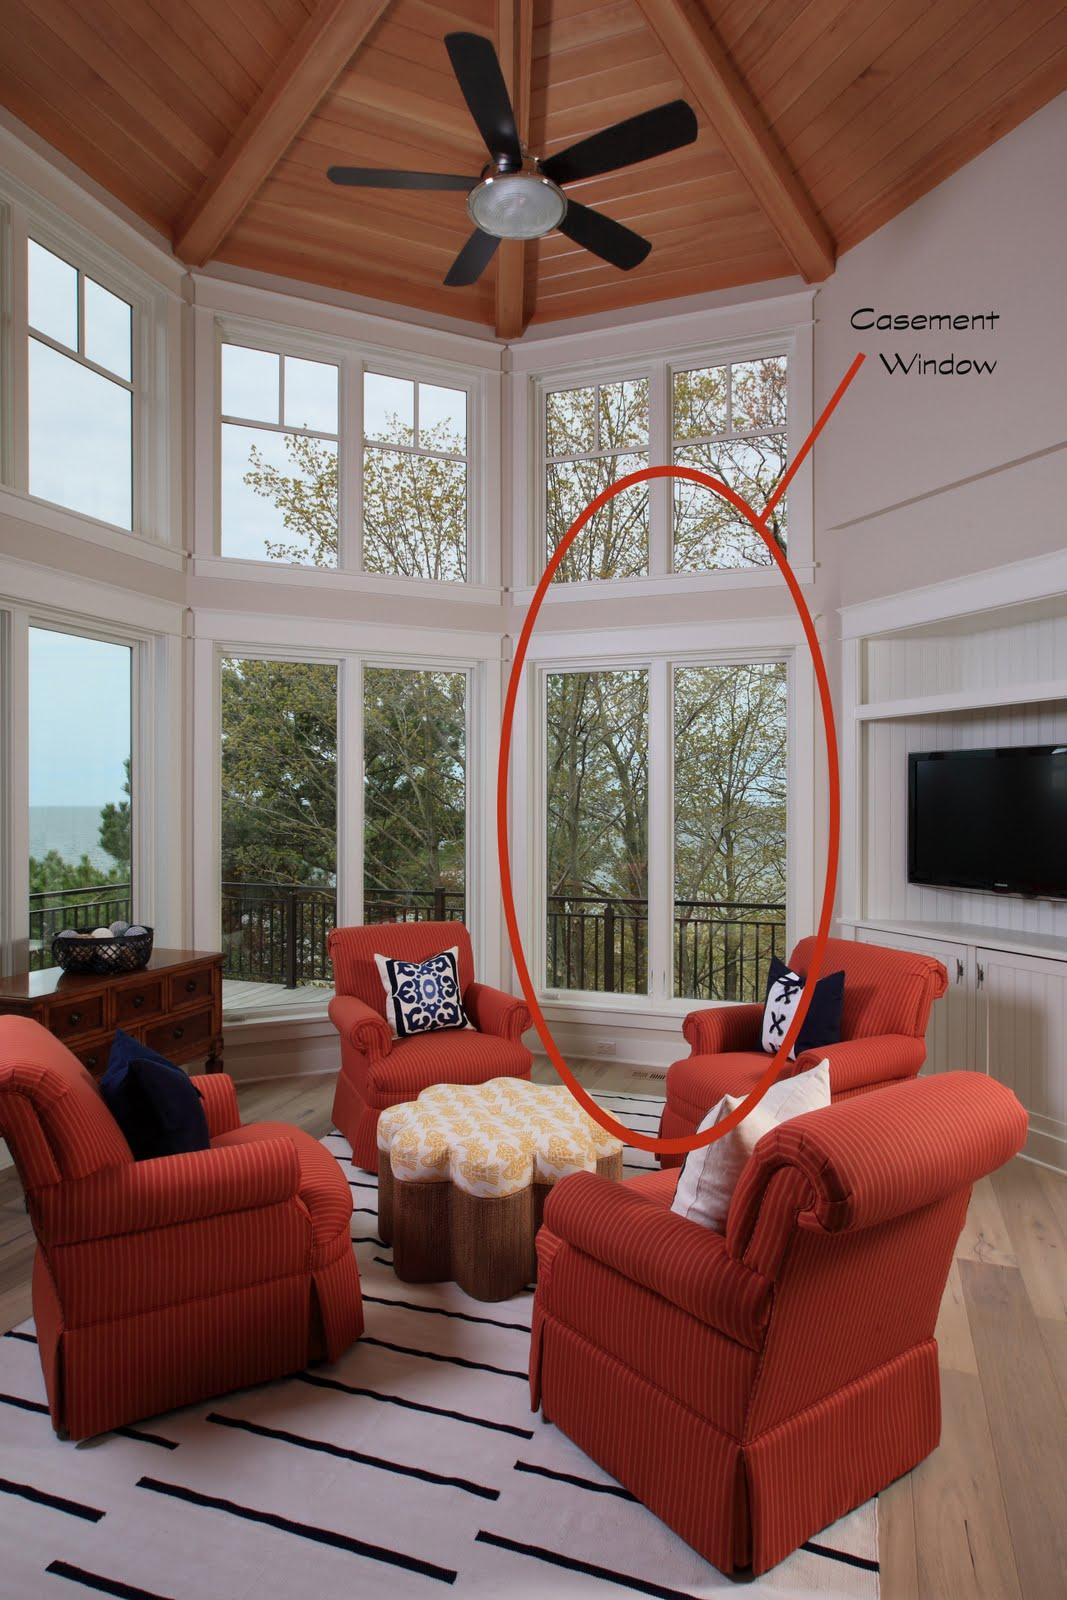 Architectural Tutorial Windows Windows Windows Visbeen - Featured designer visbeen associates